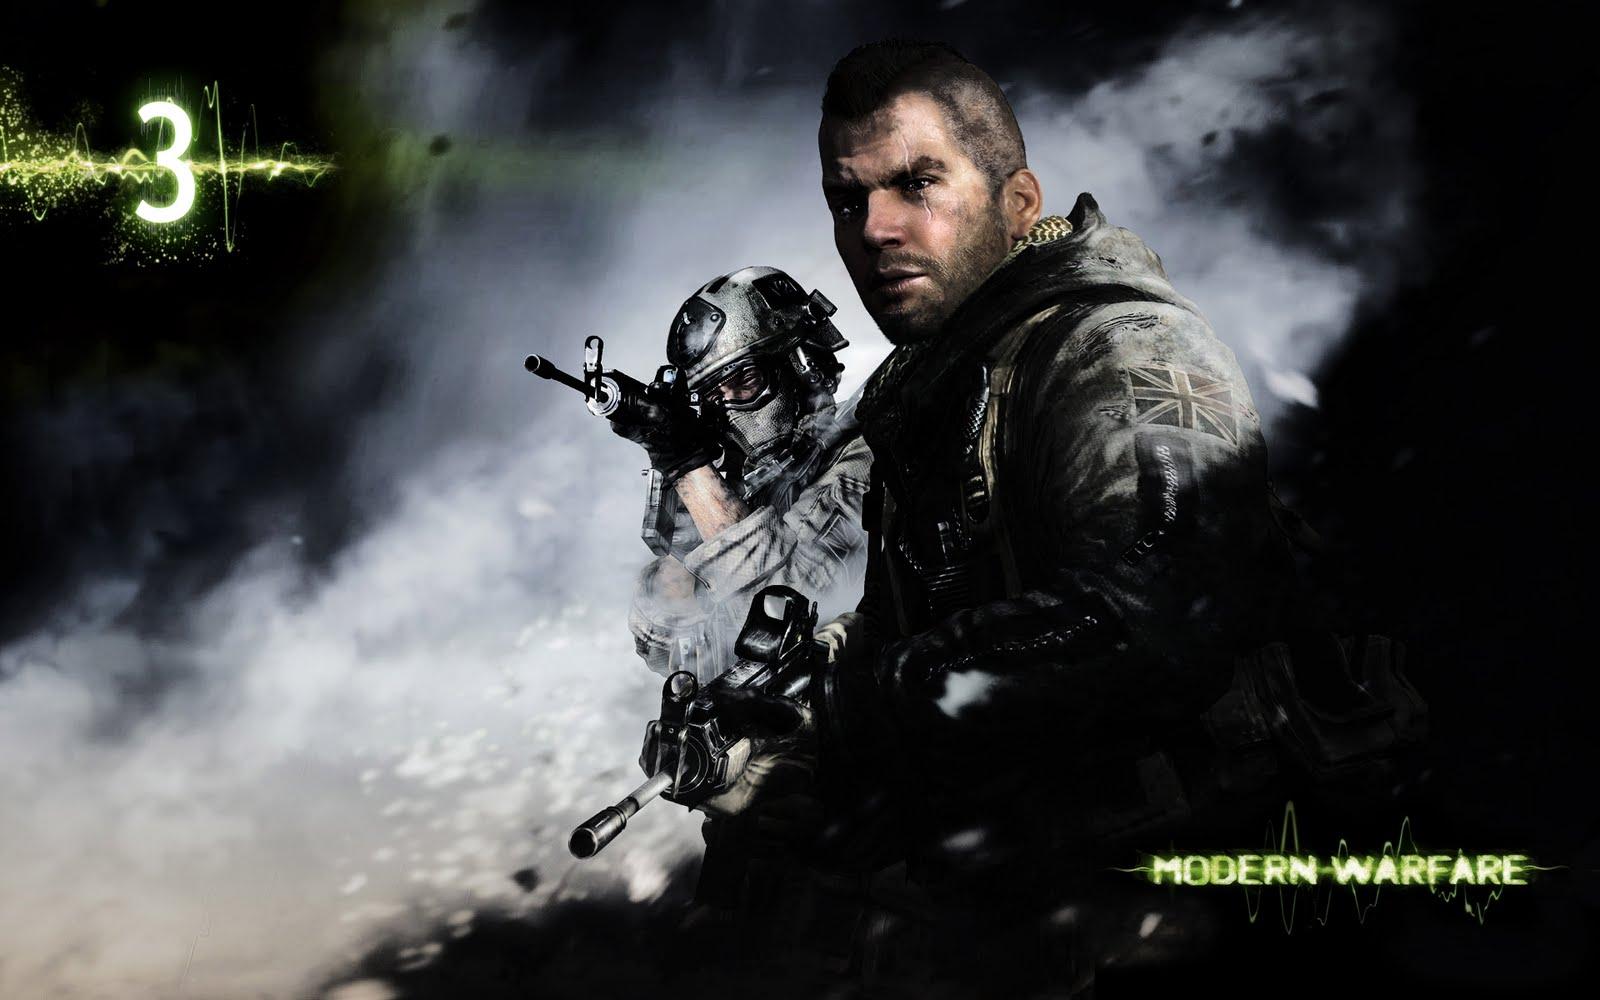 http://2.bp.blogspot.com/-3I2a6ditG5k/Te3wJhD0gpI/AAAAAAAAB8E/3ae2dC035JI/s1600/Modern-Warfare-3-1920x1200.jpg